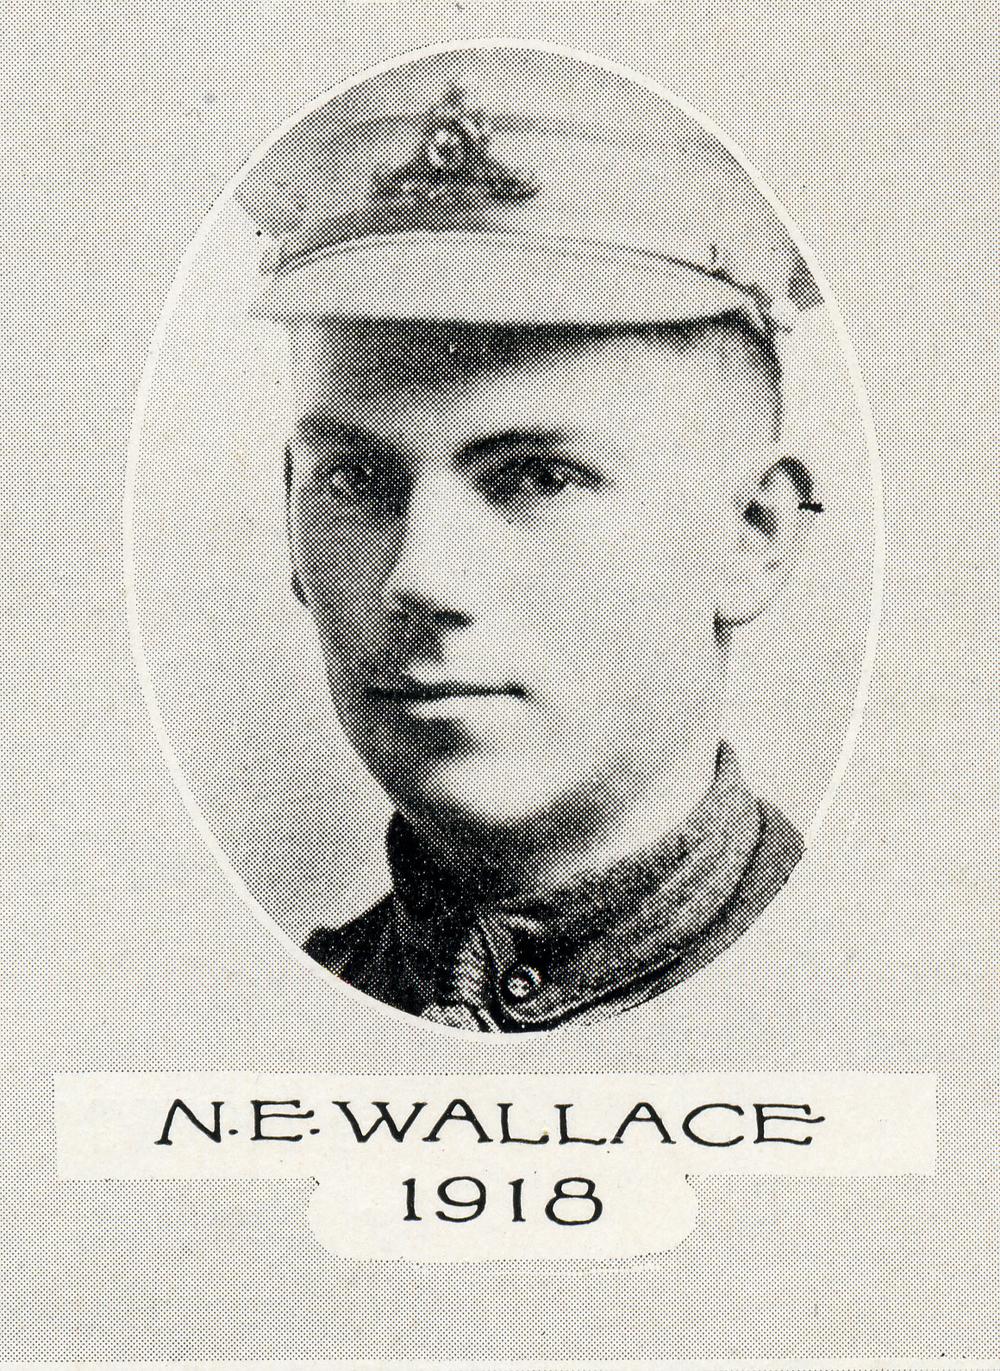 Wallace, NE Picture.jpg